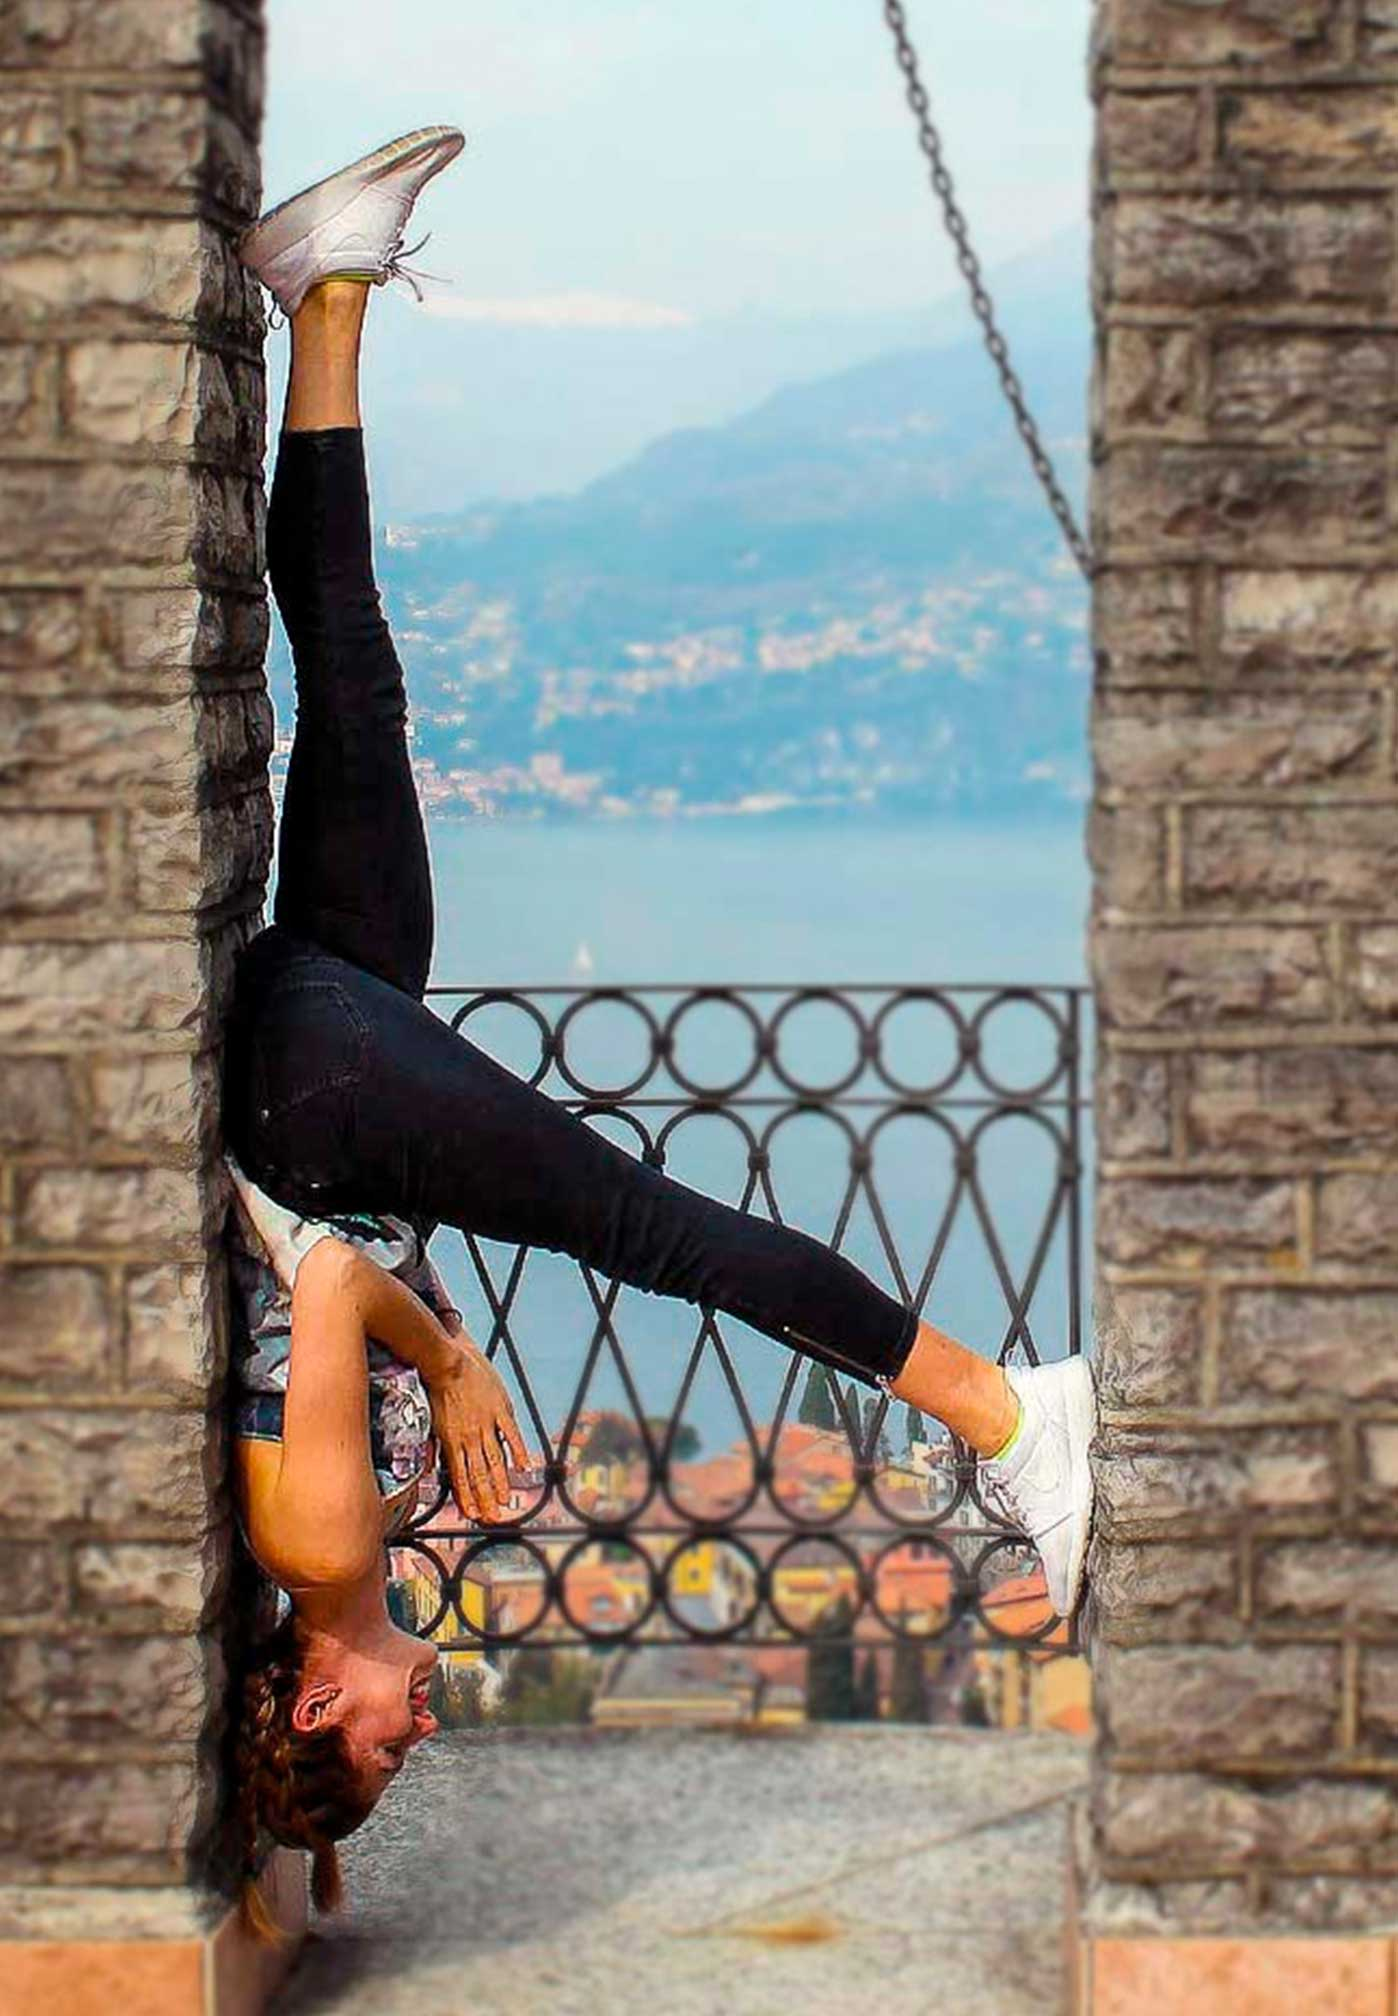 Nora Kersten in Yoga Pose